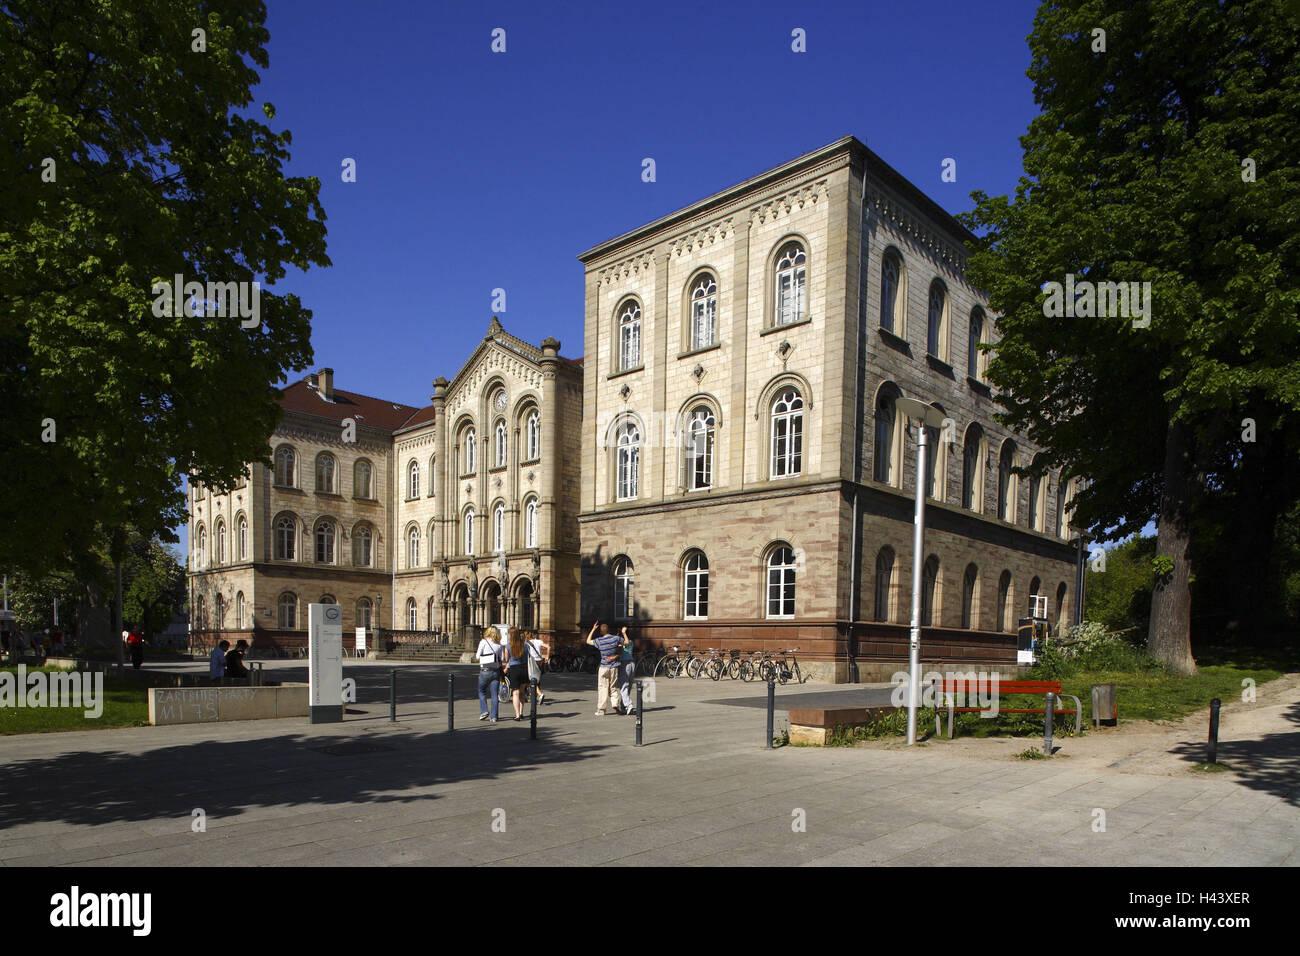 Germany, Lower Saxony, Goettingen, university, lecture hall maximum, - Stock Image